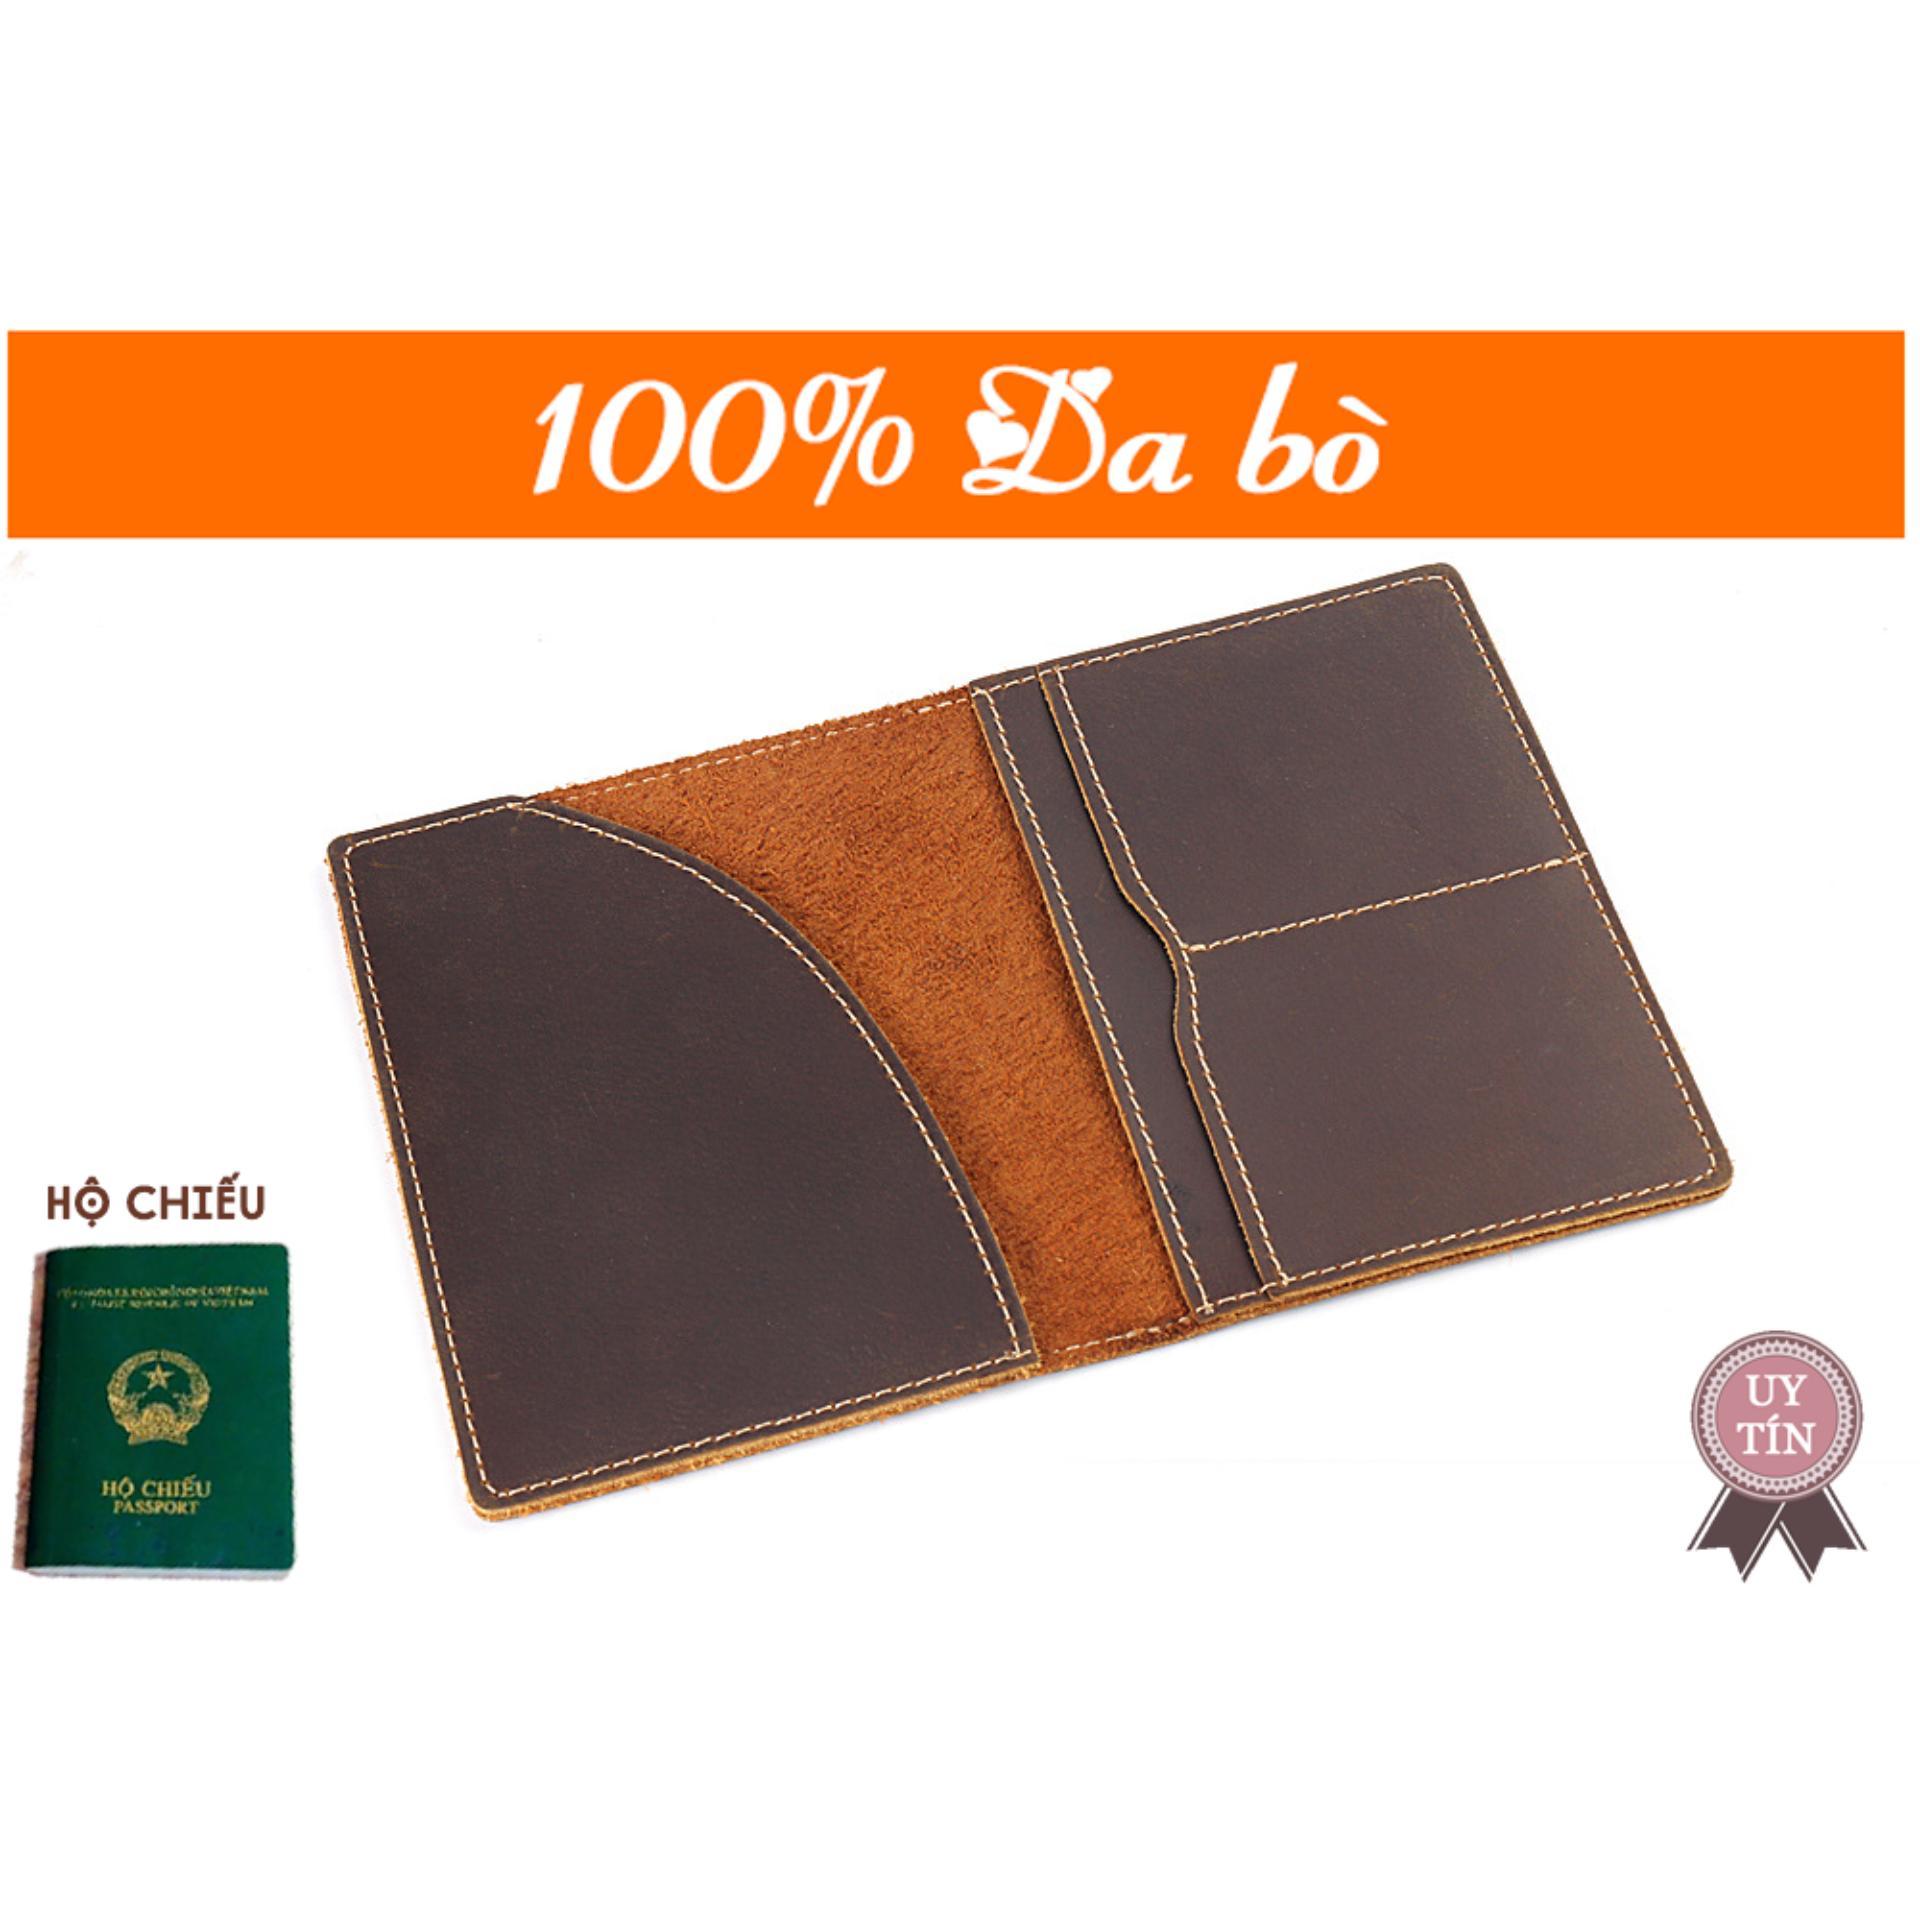 Ví Da Passport Chứa Hộ Chiếu Du Lịch Kn001